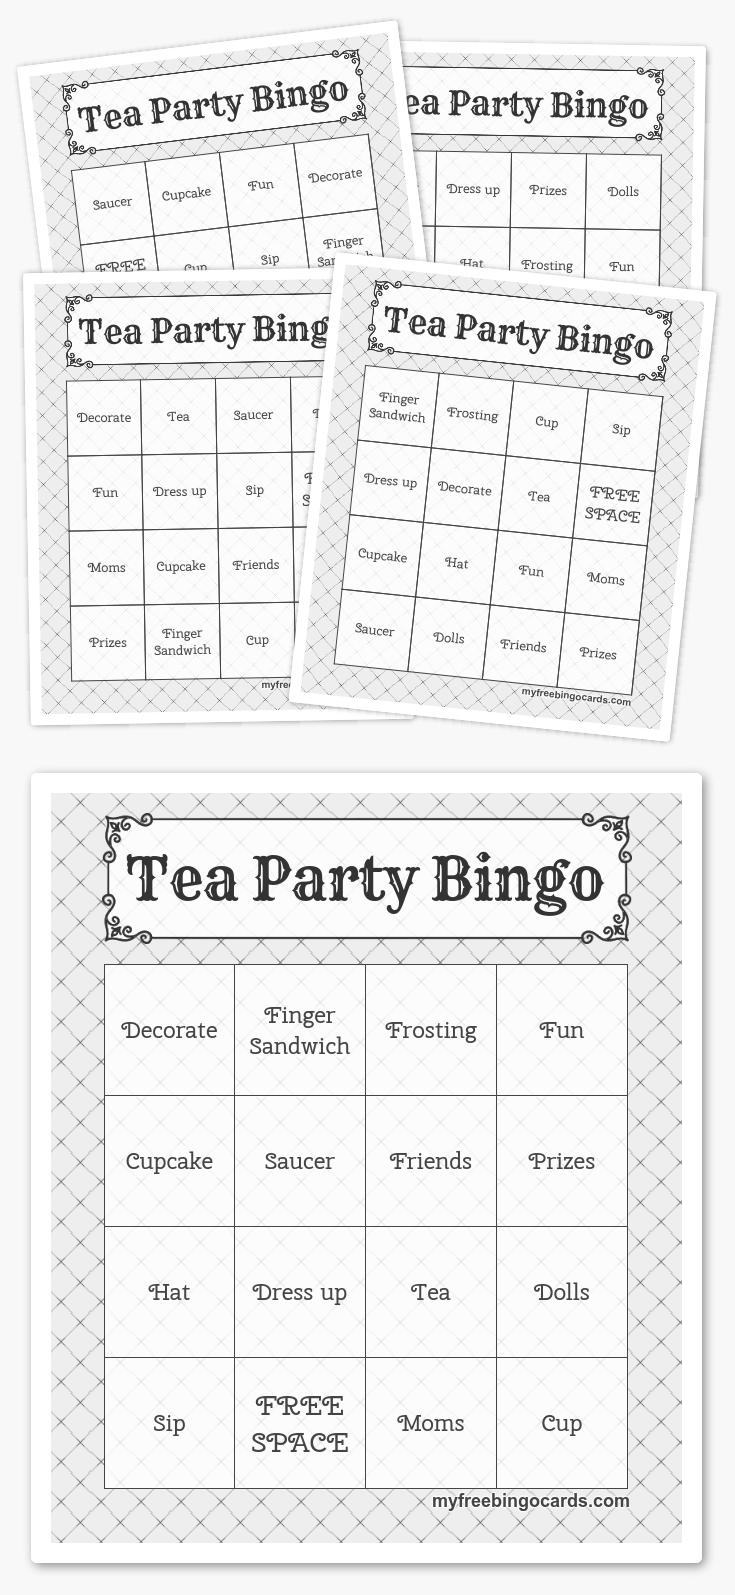 Free Printable Bingo Cards In 2019 | Printables | Harry Potter Games - Free Printable Bingo Cards